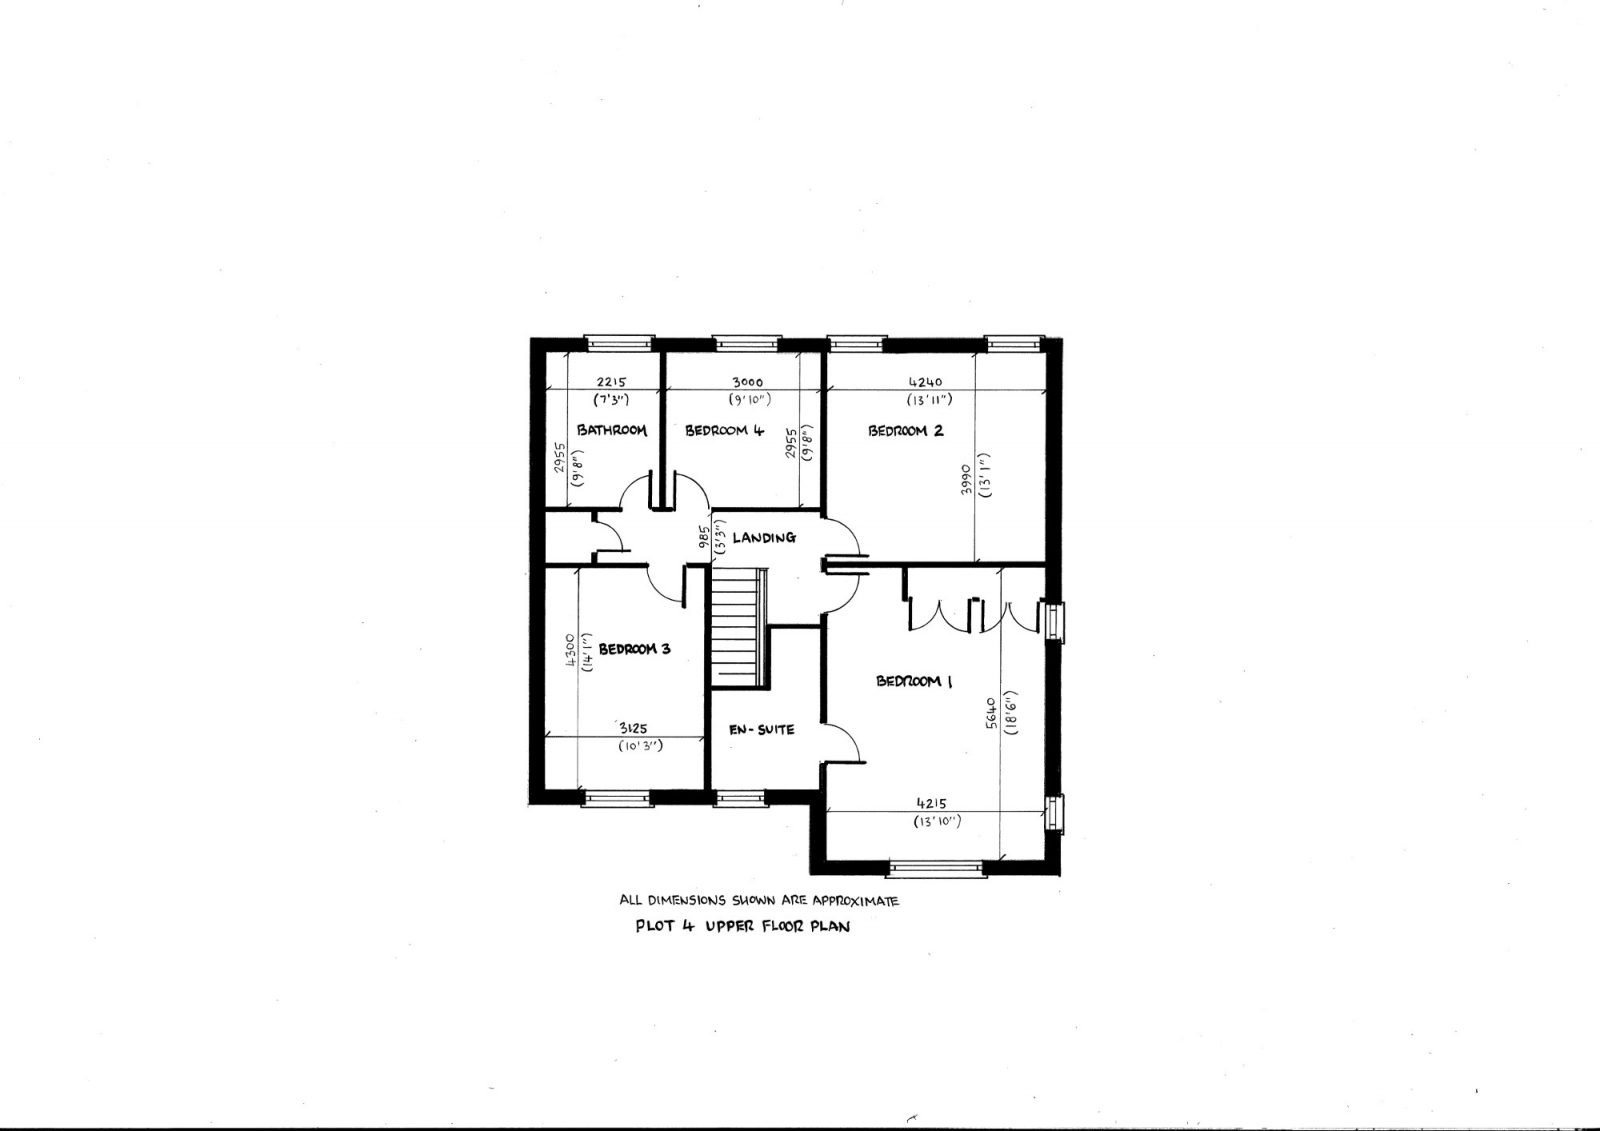 Plot 4 upper floor plan richard reed builders for Find plot plan online